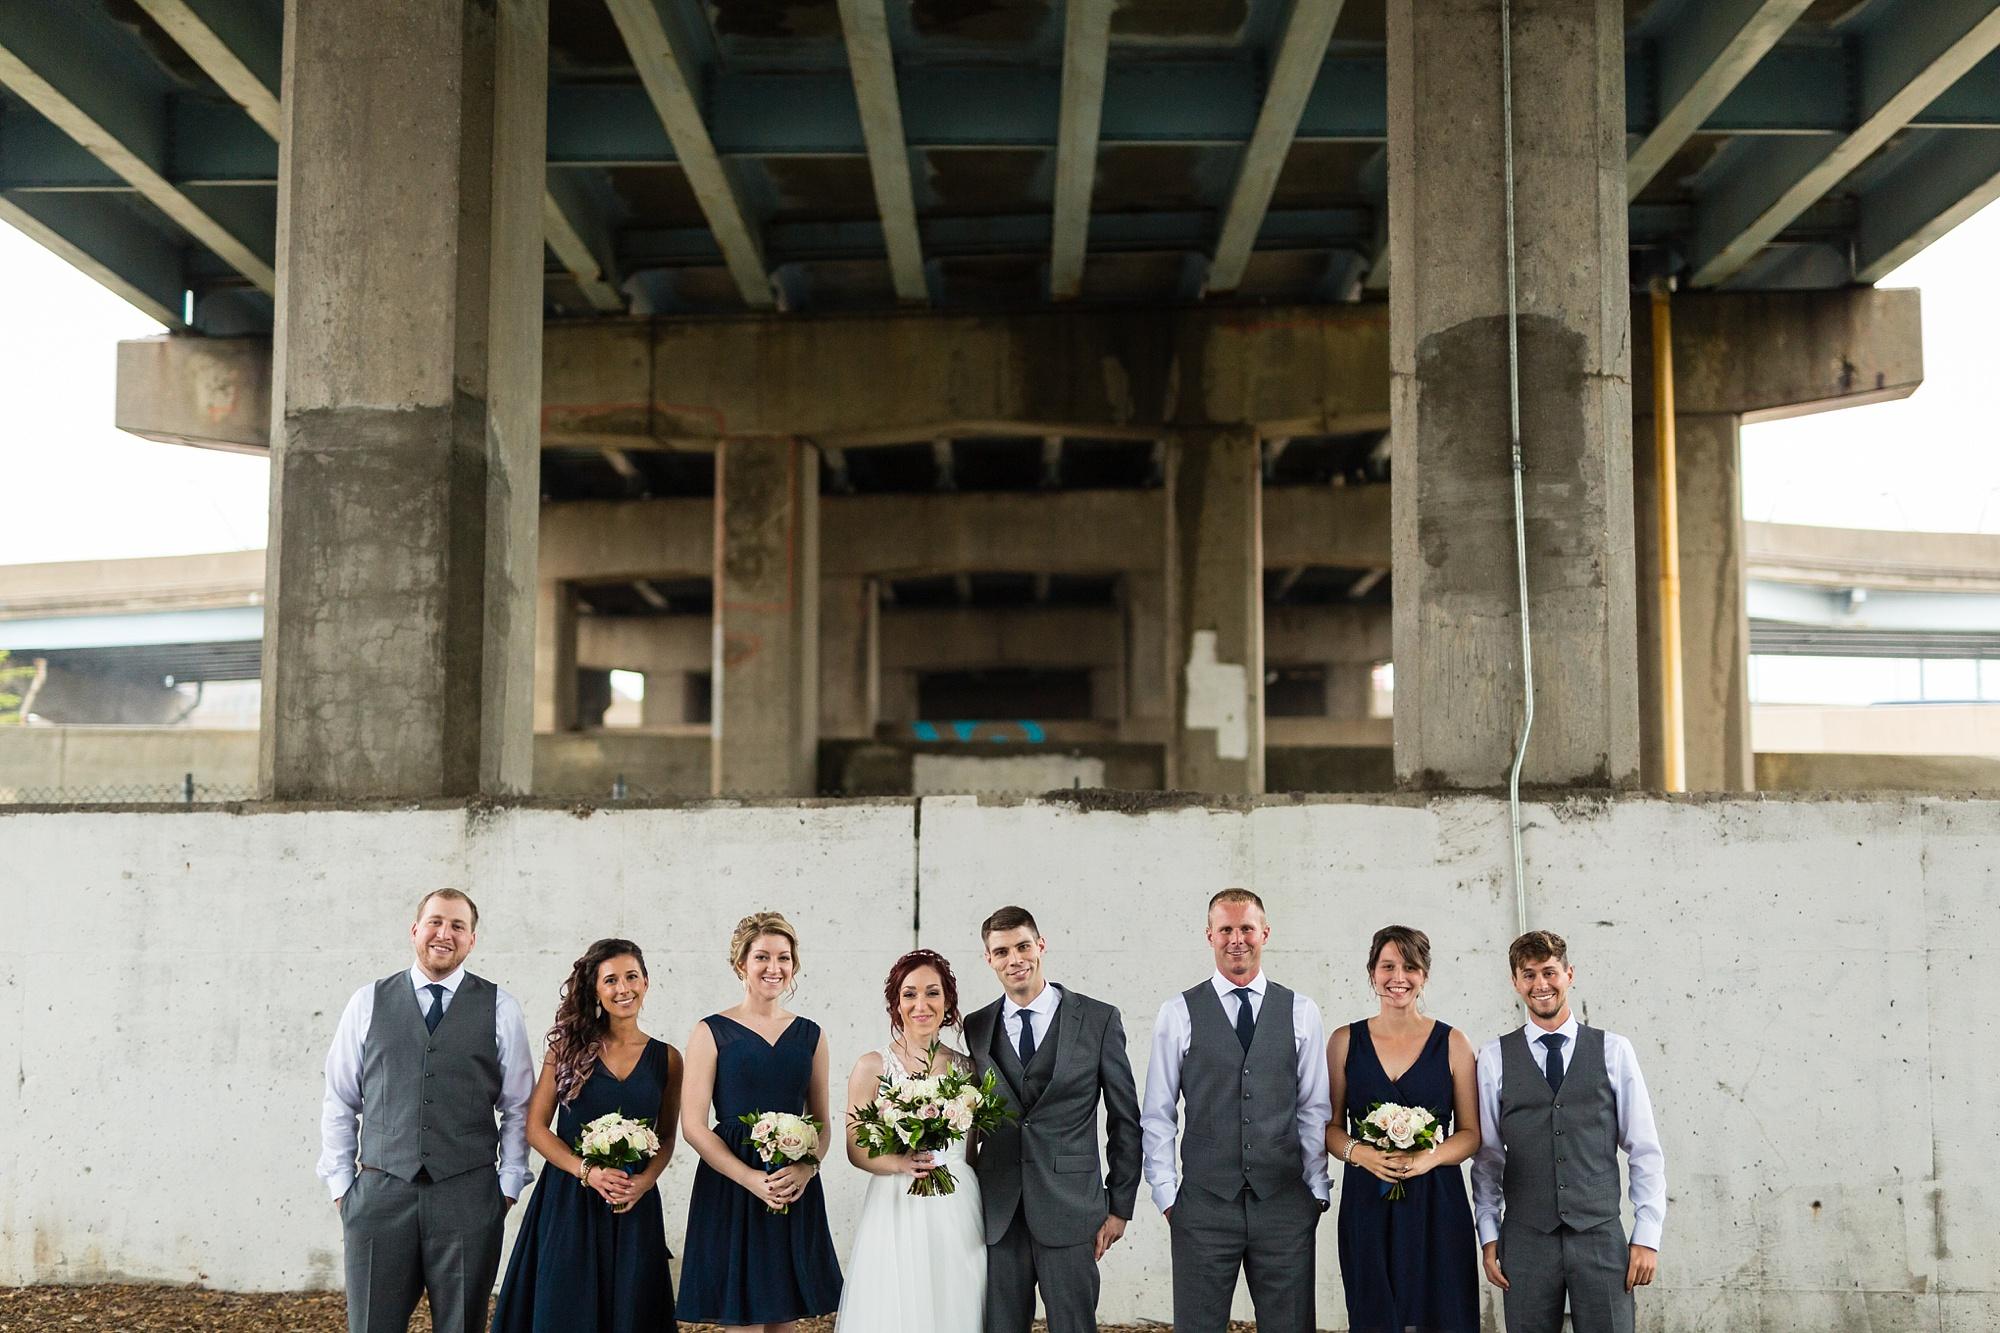 Brandon_Shafer_Photography_Lauren_Ethan_New_Vintage_Place_Grand_Rapids_Wedding_0027.jpg